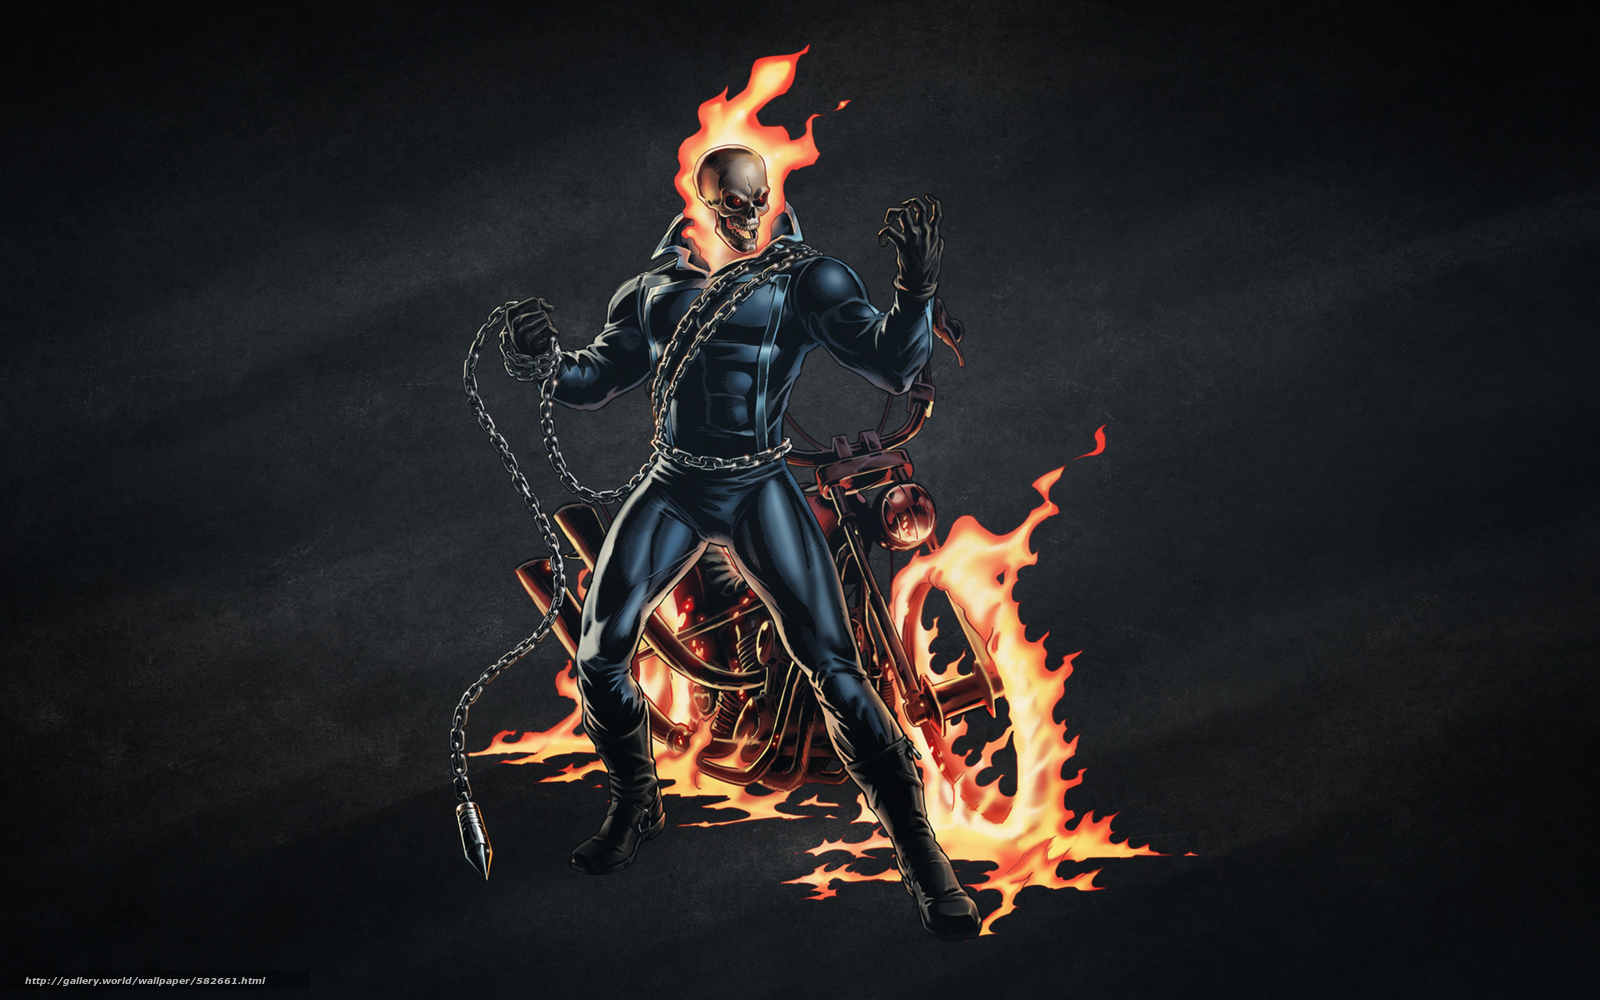 Fire Skeleton Riding Motorcycle Stock Illustration 59627467 ...